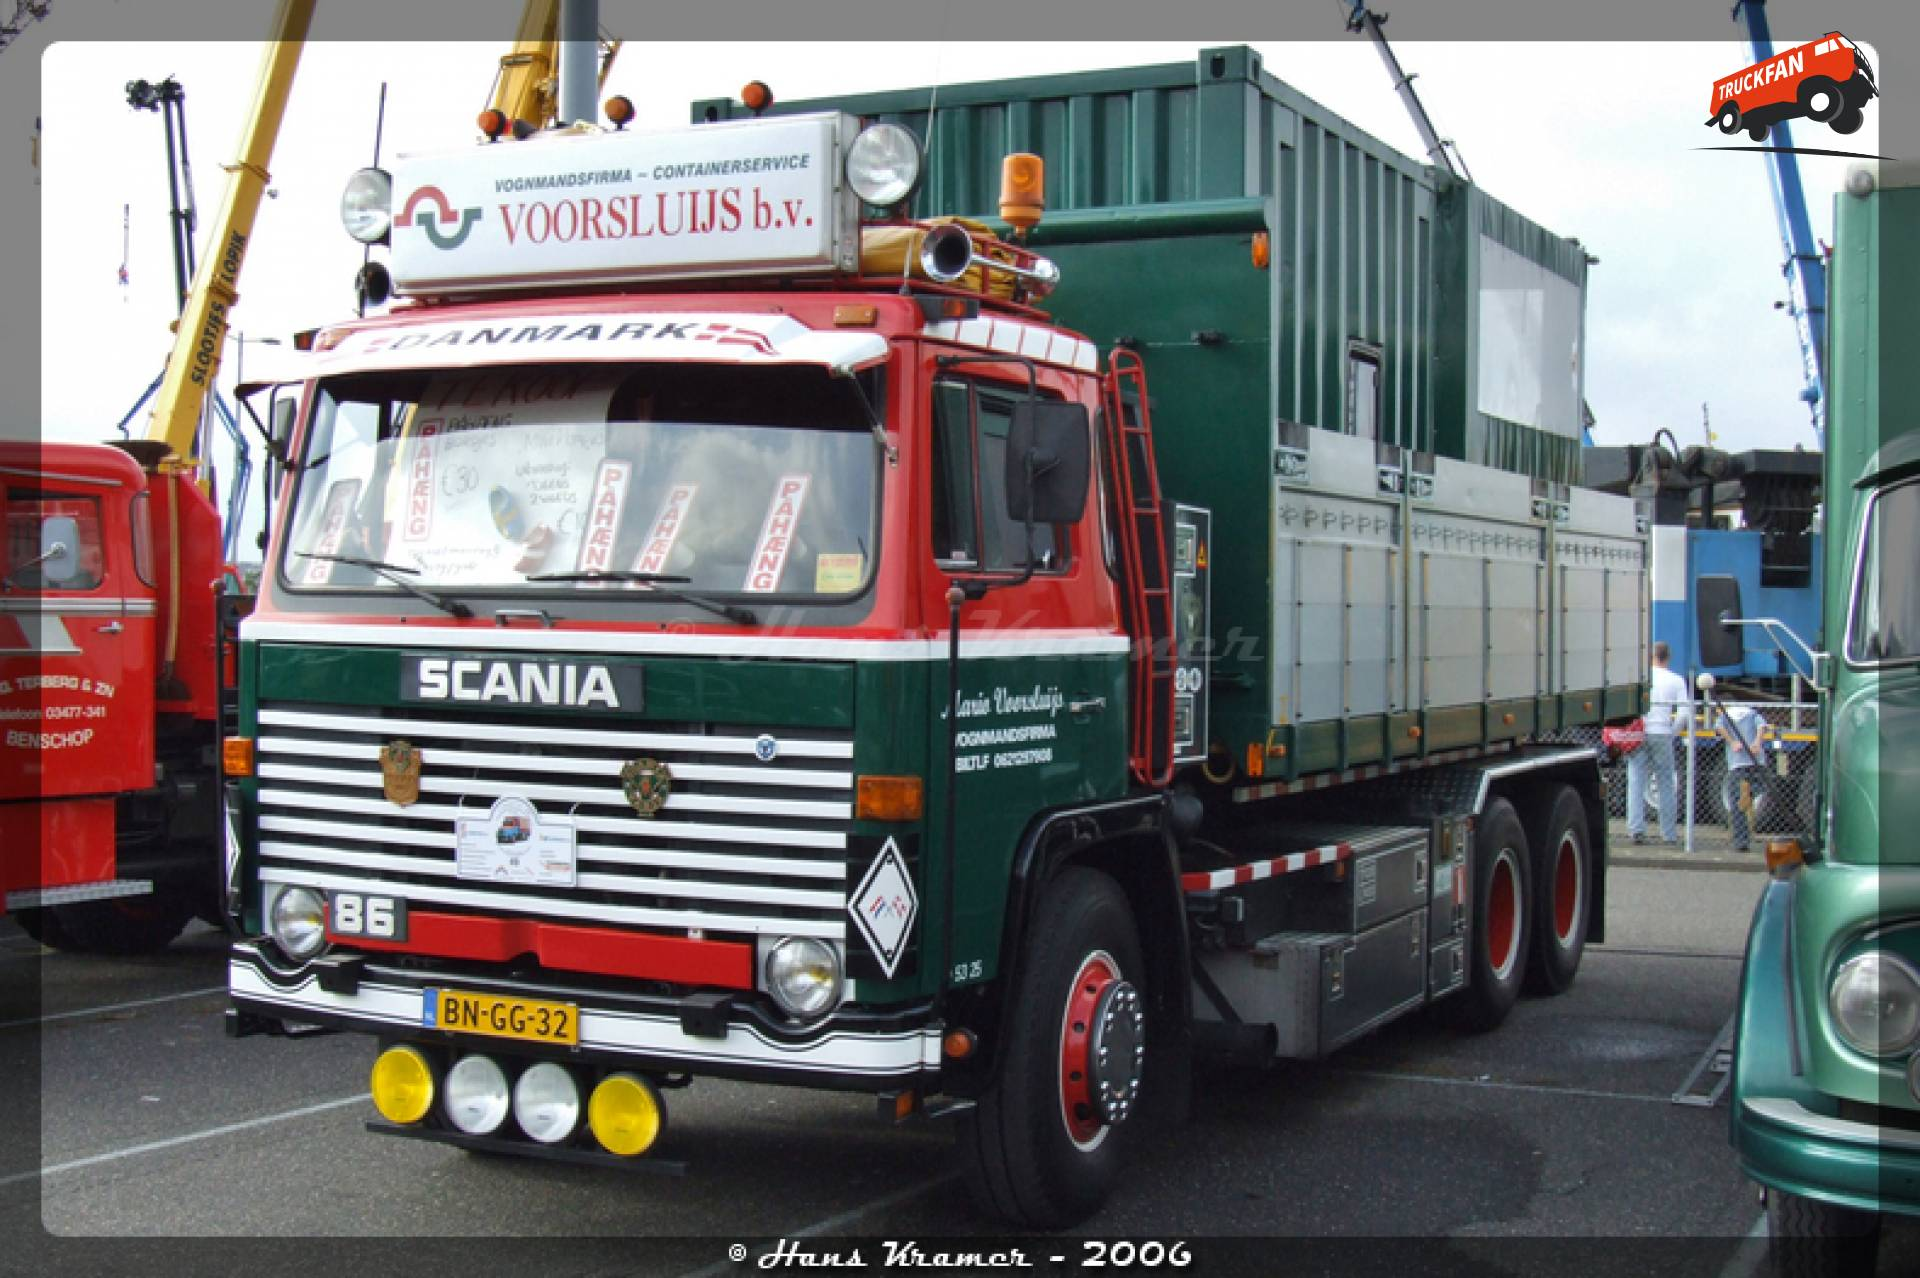 Scania 86